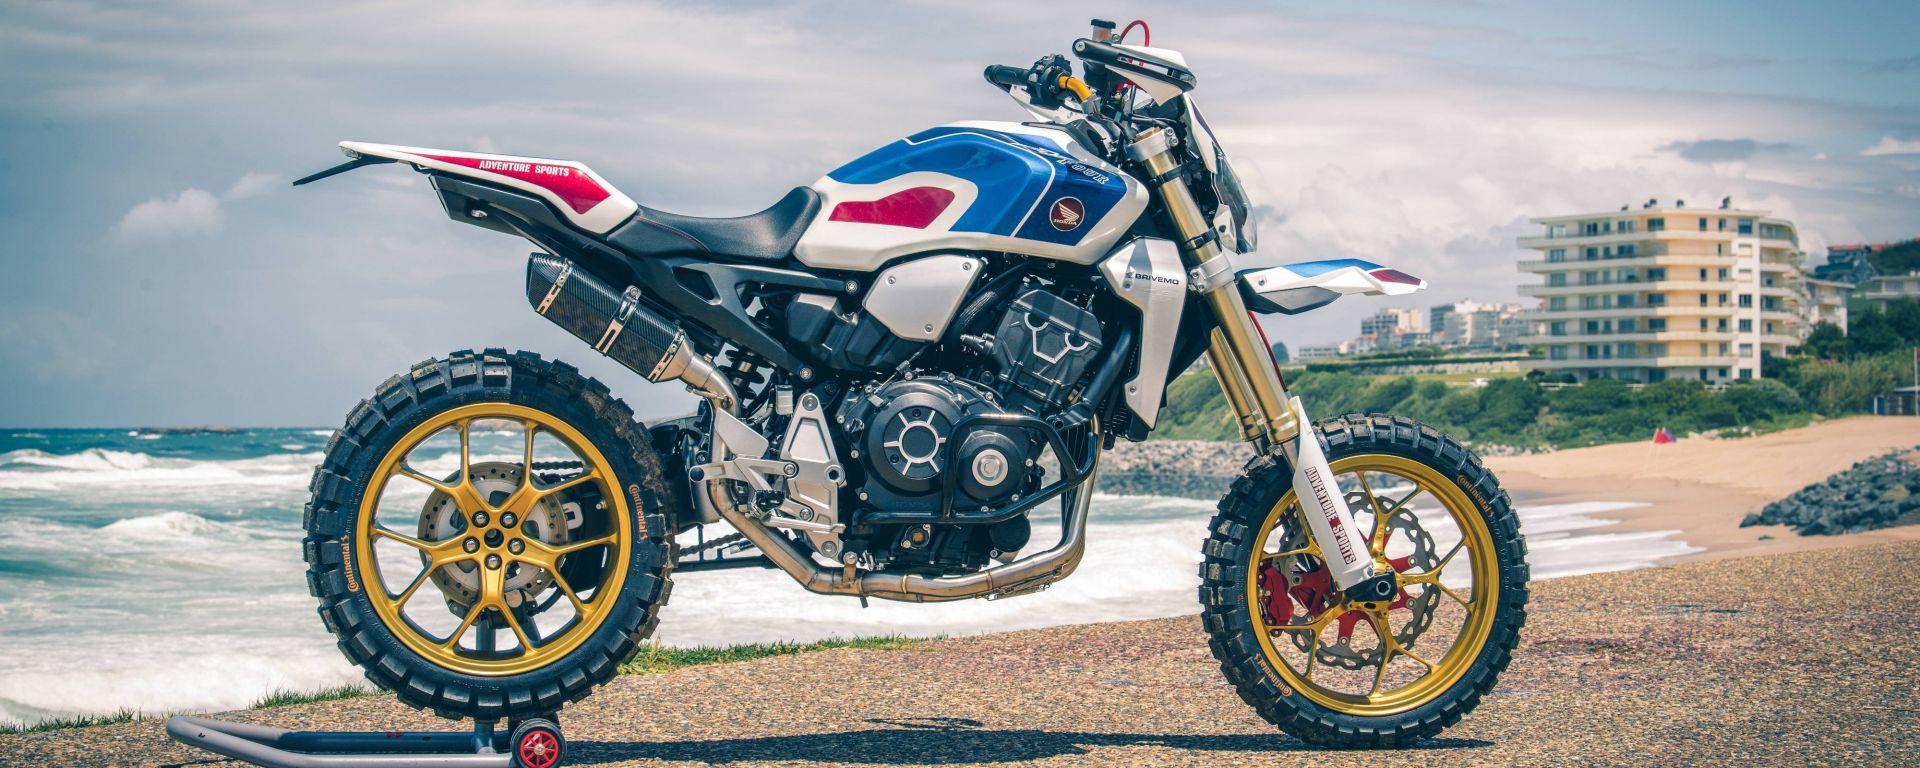 Honda CB 1000 R: le special di Wheel & Waves